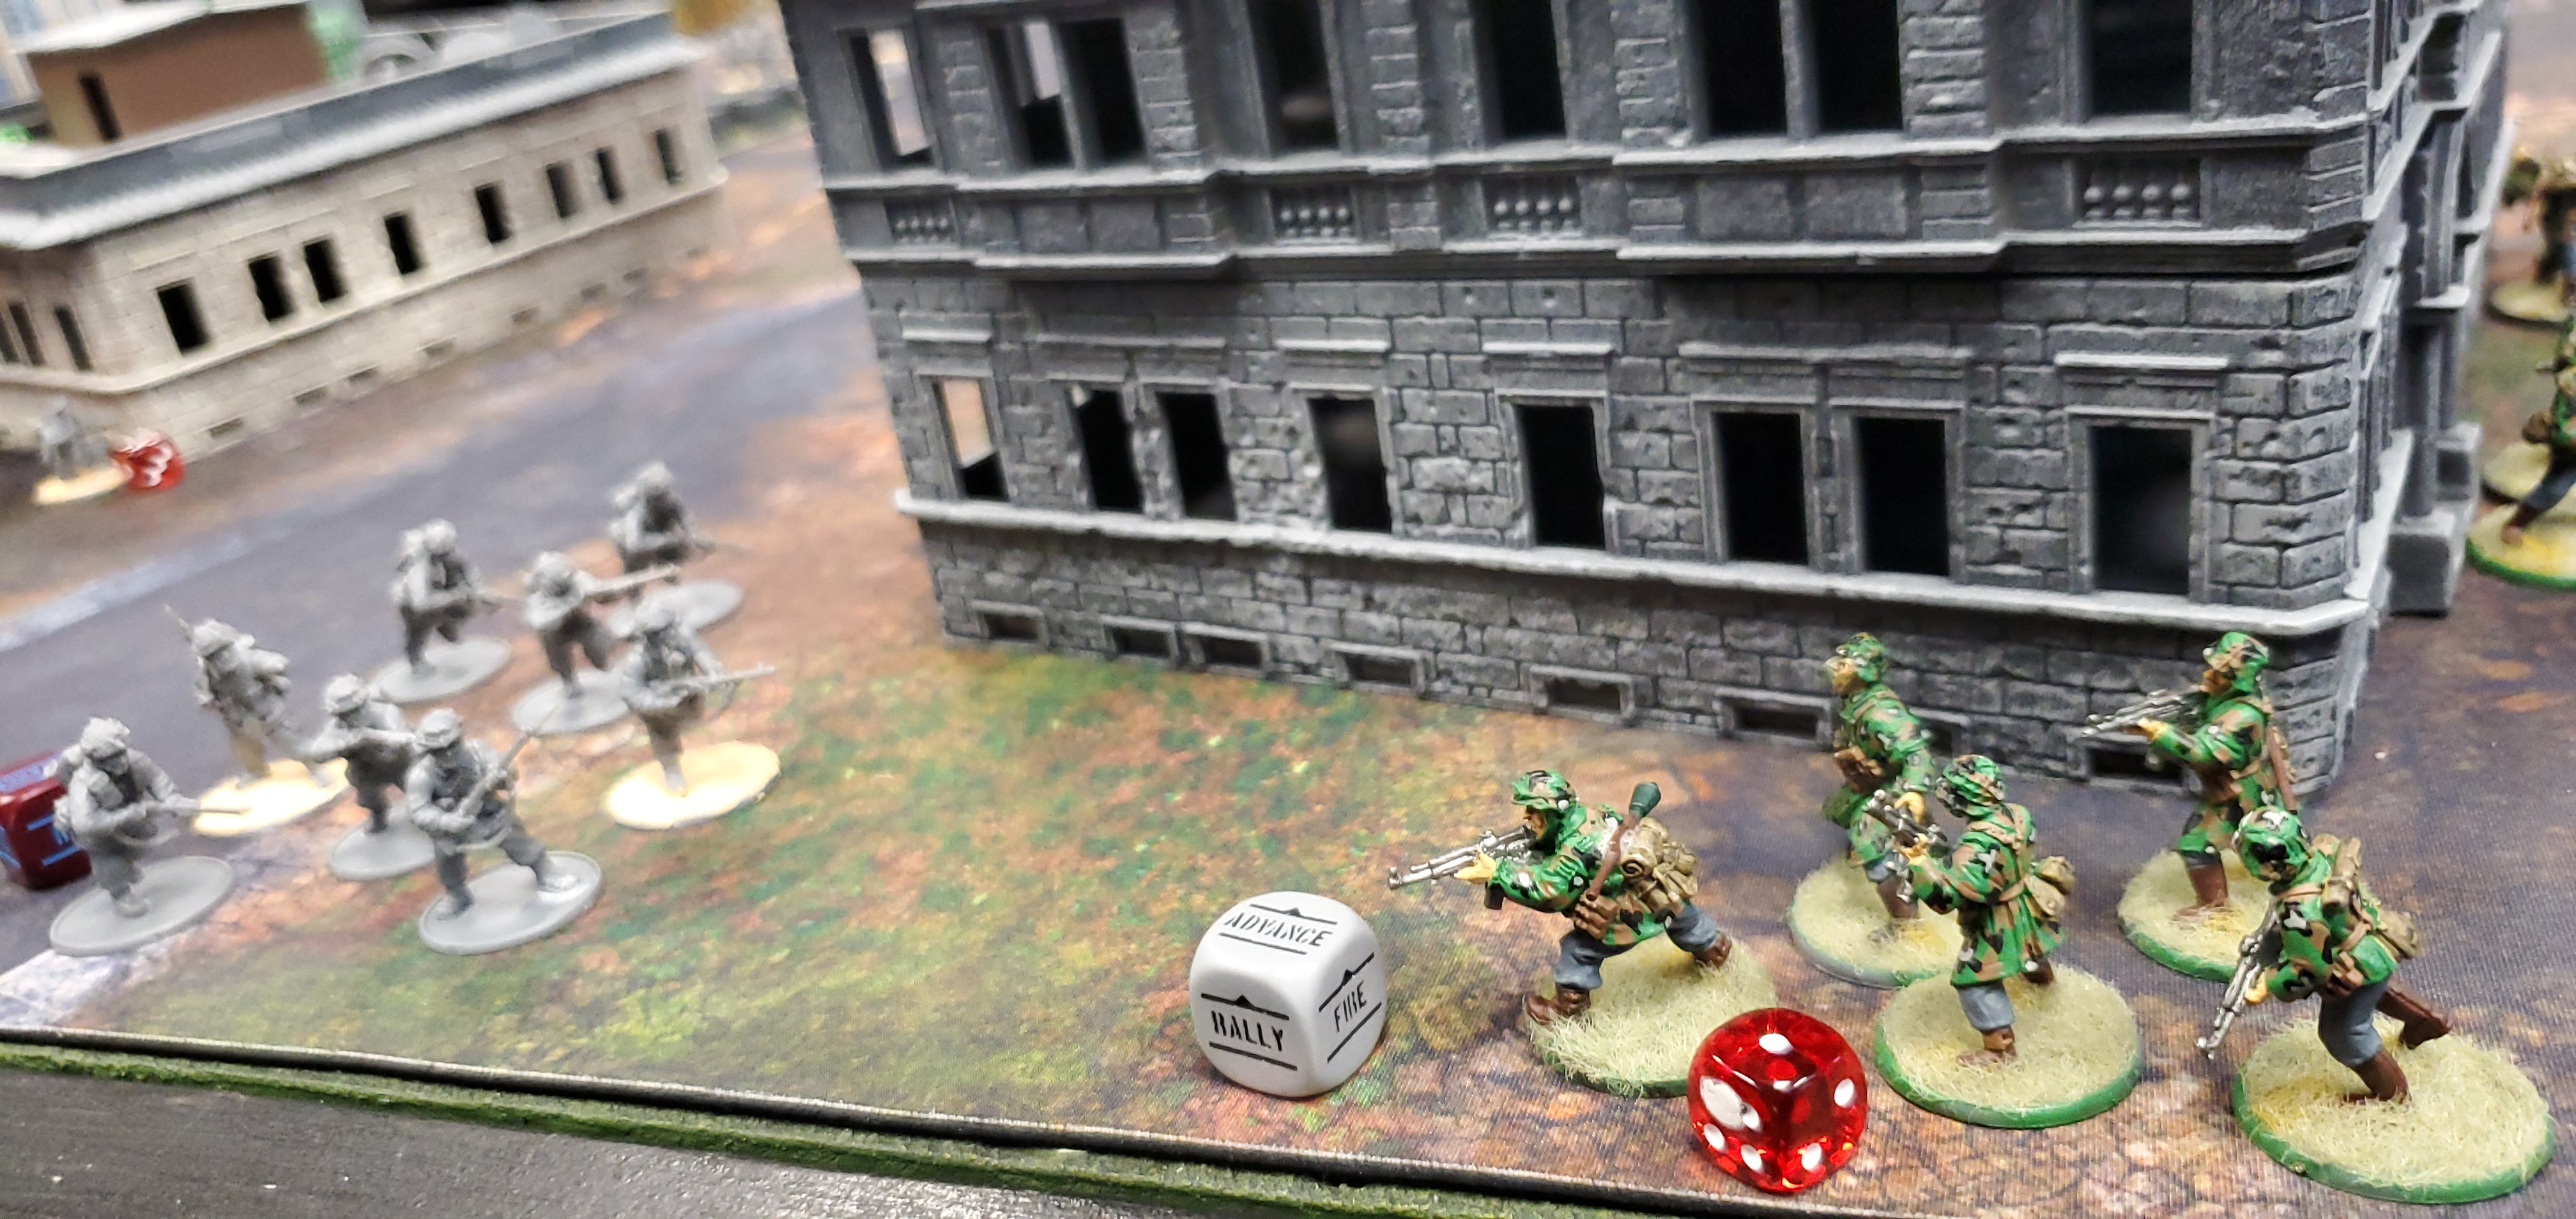 1st SS Panzer Division Leibstandarte SS Adolf Hitler versus 1st lawndarts in a fierce infantry engagement